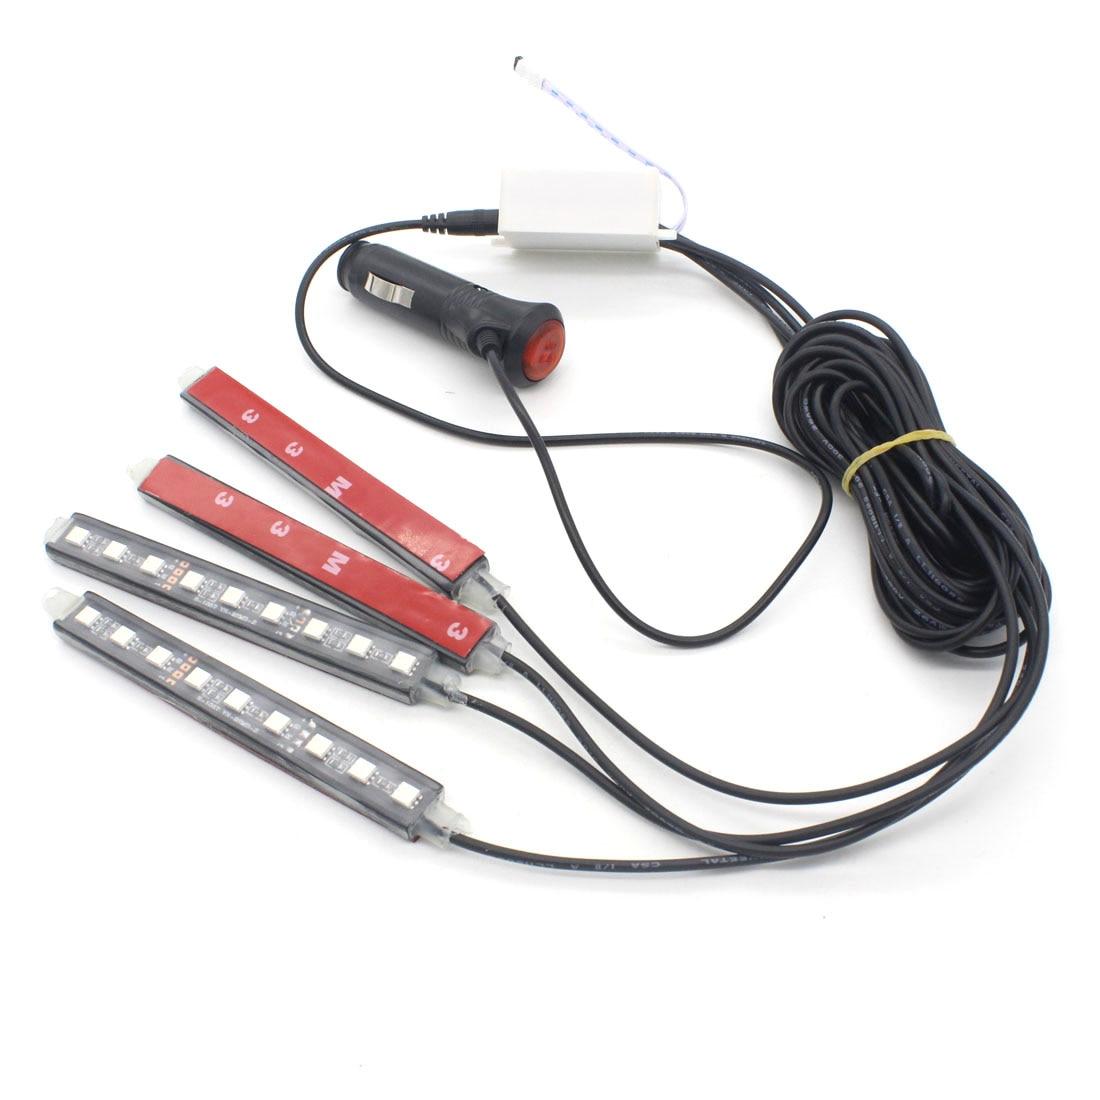 4X LED Car RBG Strip Light LED Decorative Atmosphere Lamp Auto Wireless Remote Interior Lighting Multi Color Car Styling